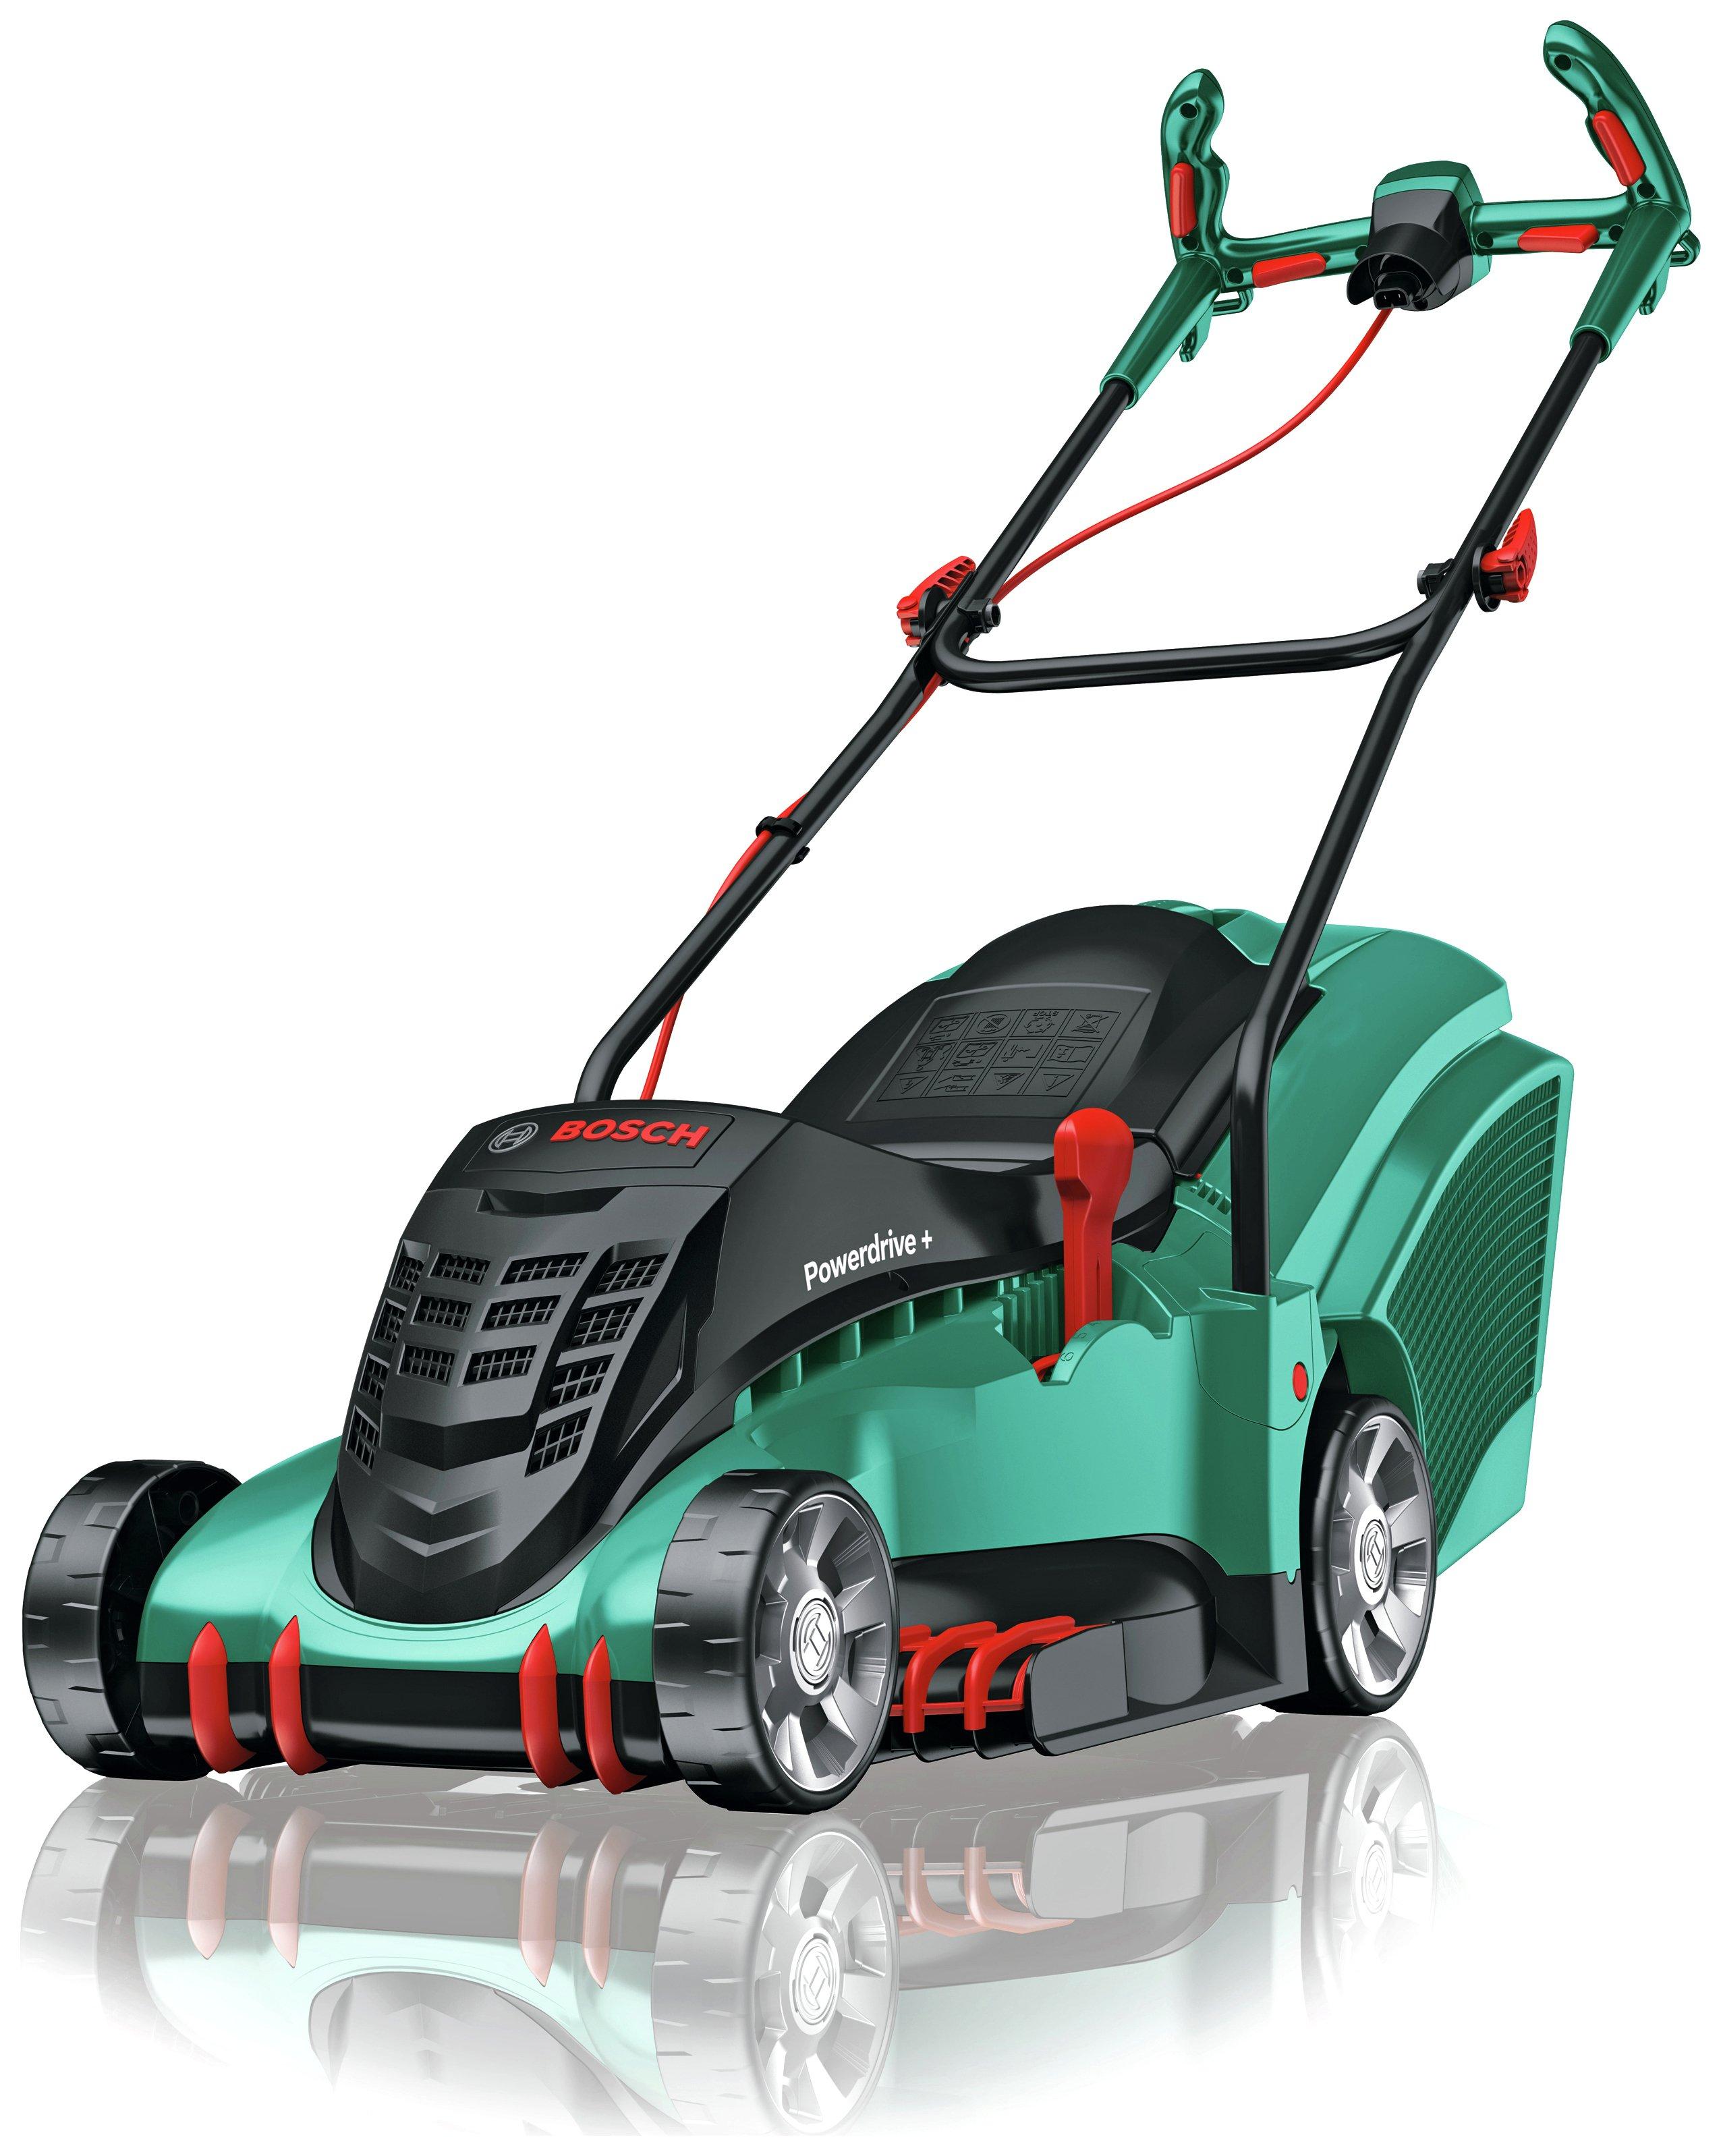 bosch rotak 40 17 ergoflex corded rotary lawnmower 1700w review. Black Bedroom Furniture Sets. Home Design Ideas